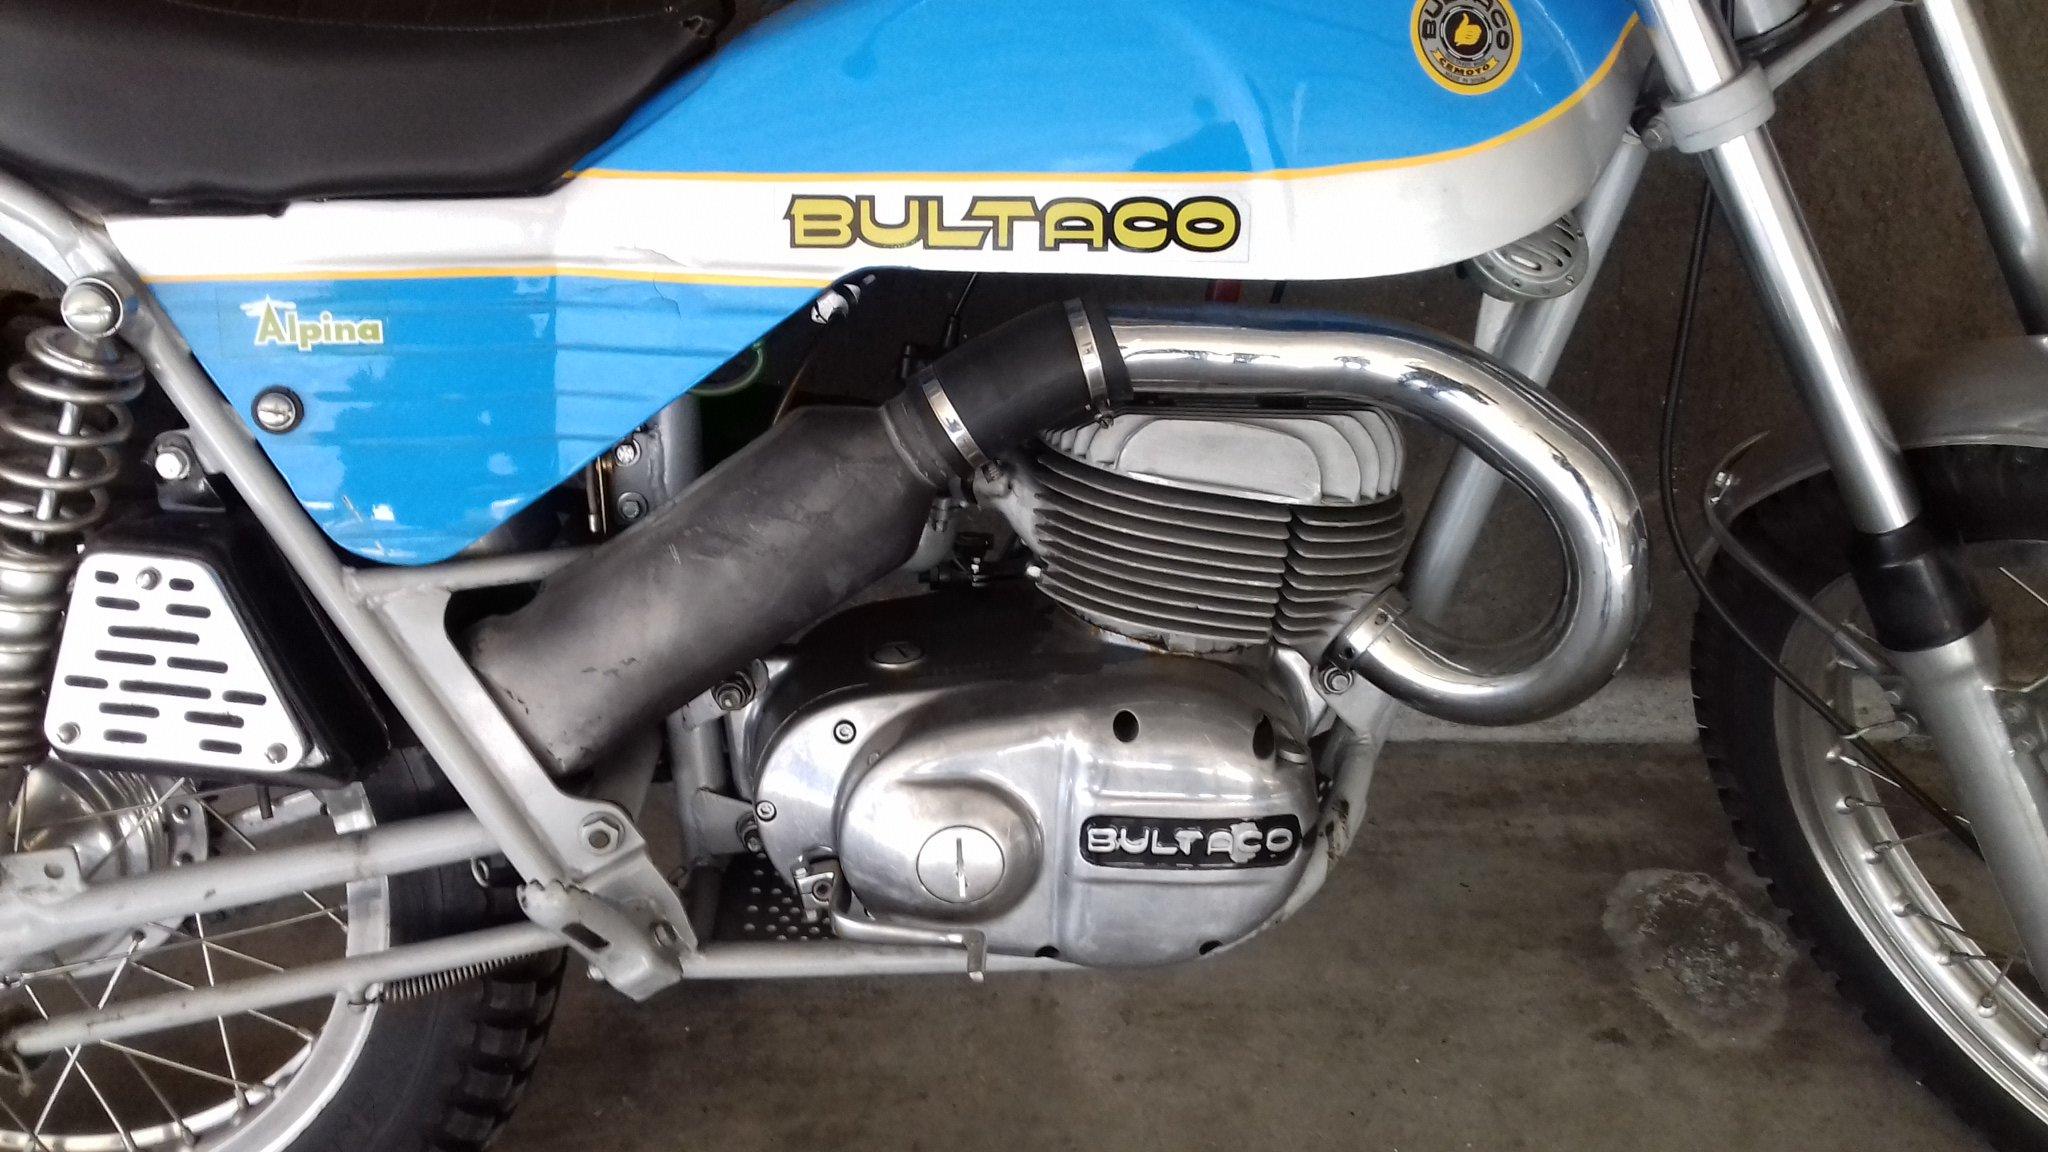 1973 Bultaco Alpina 250 For Sale (picture 2 of 6)